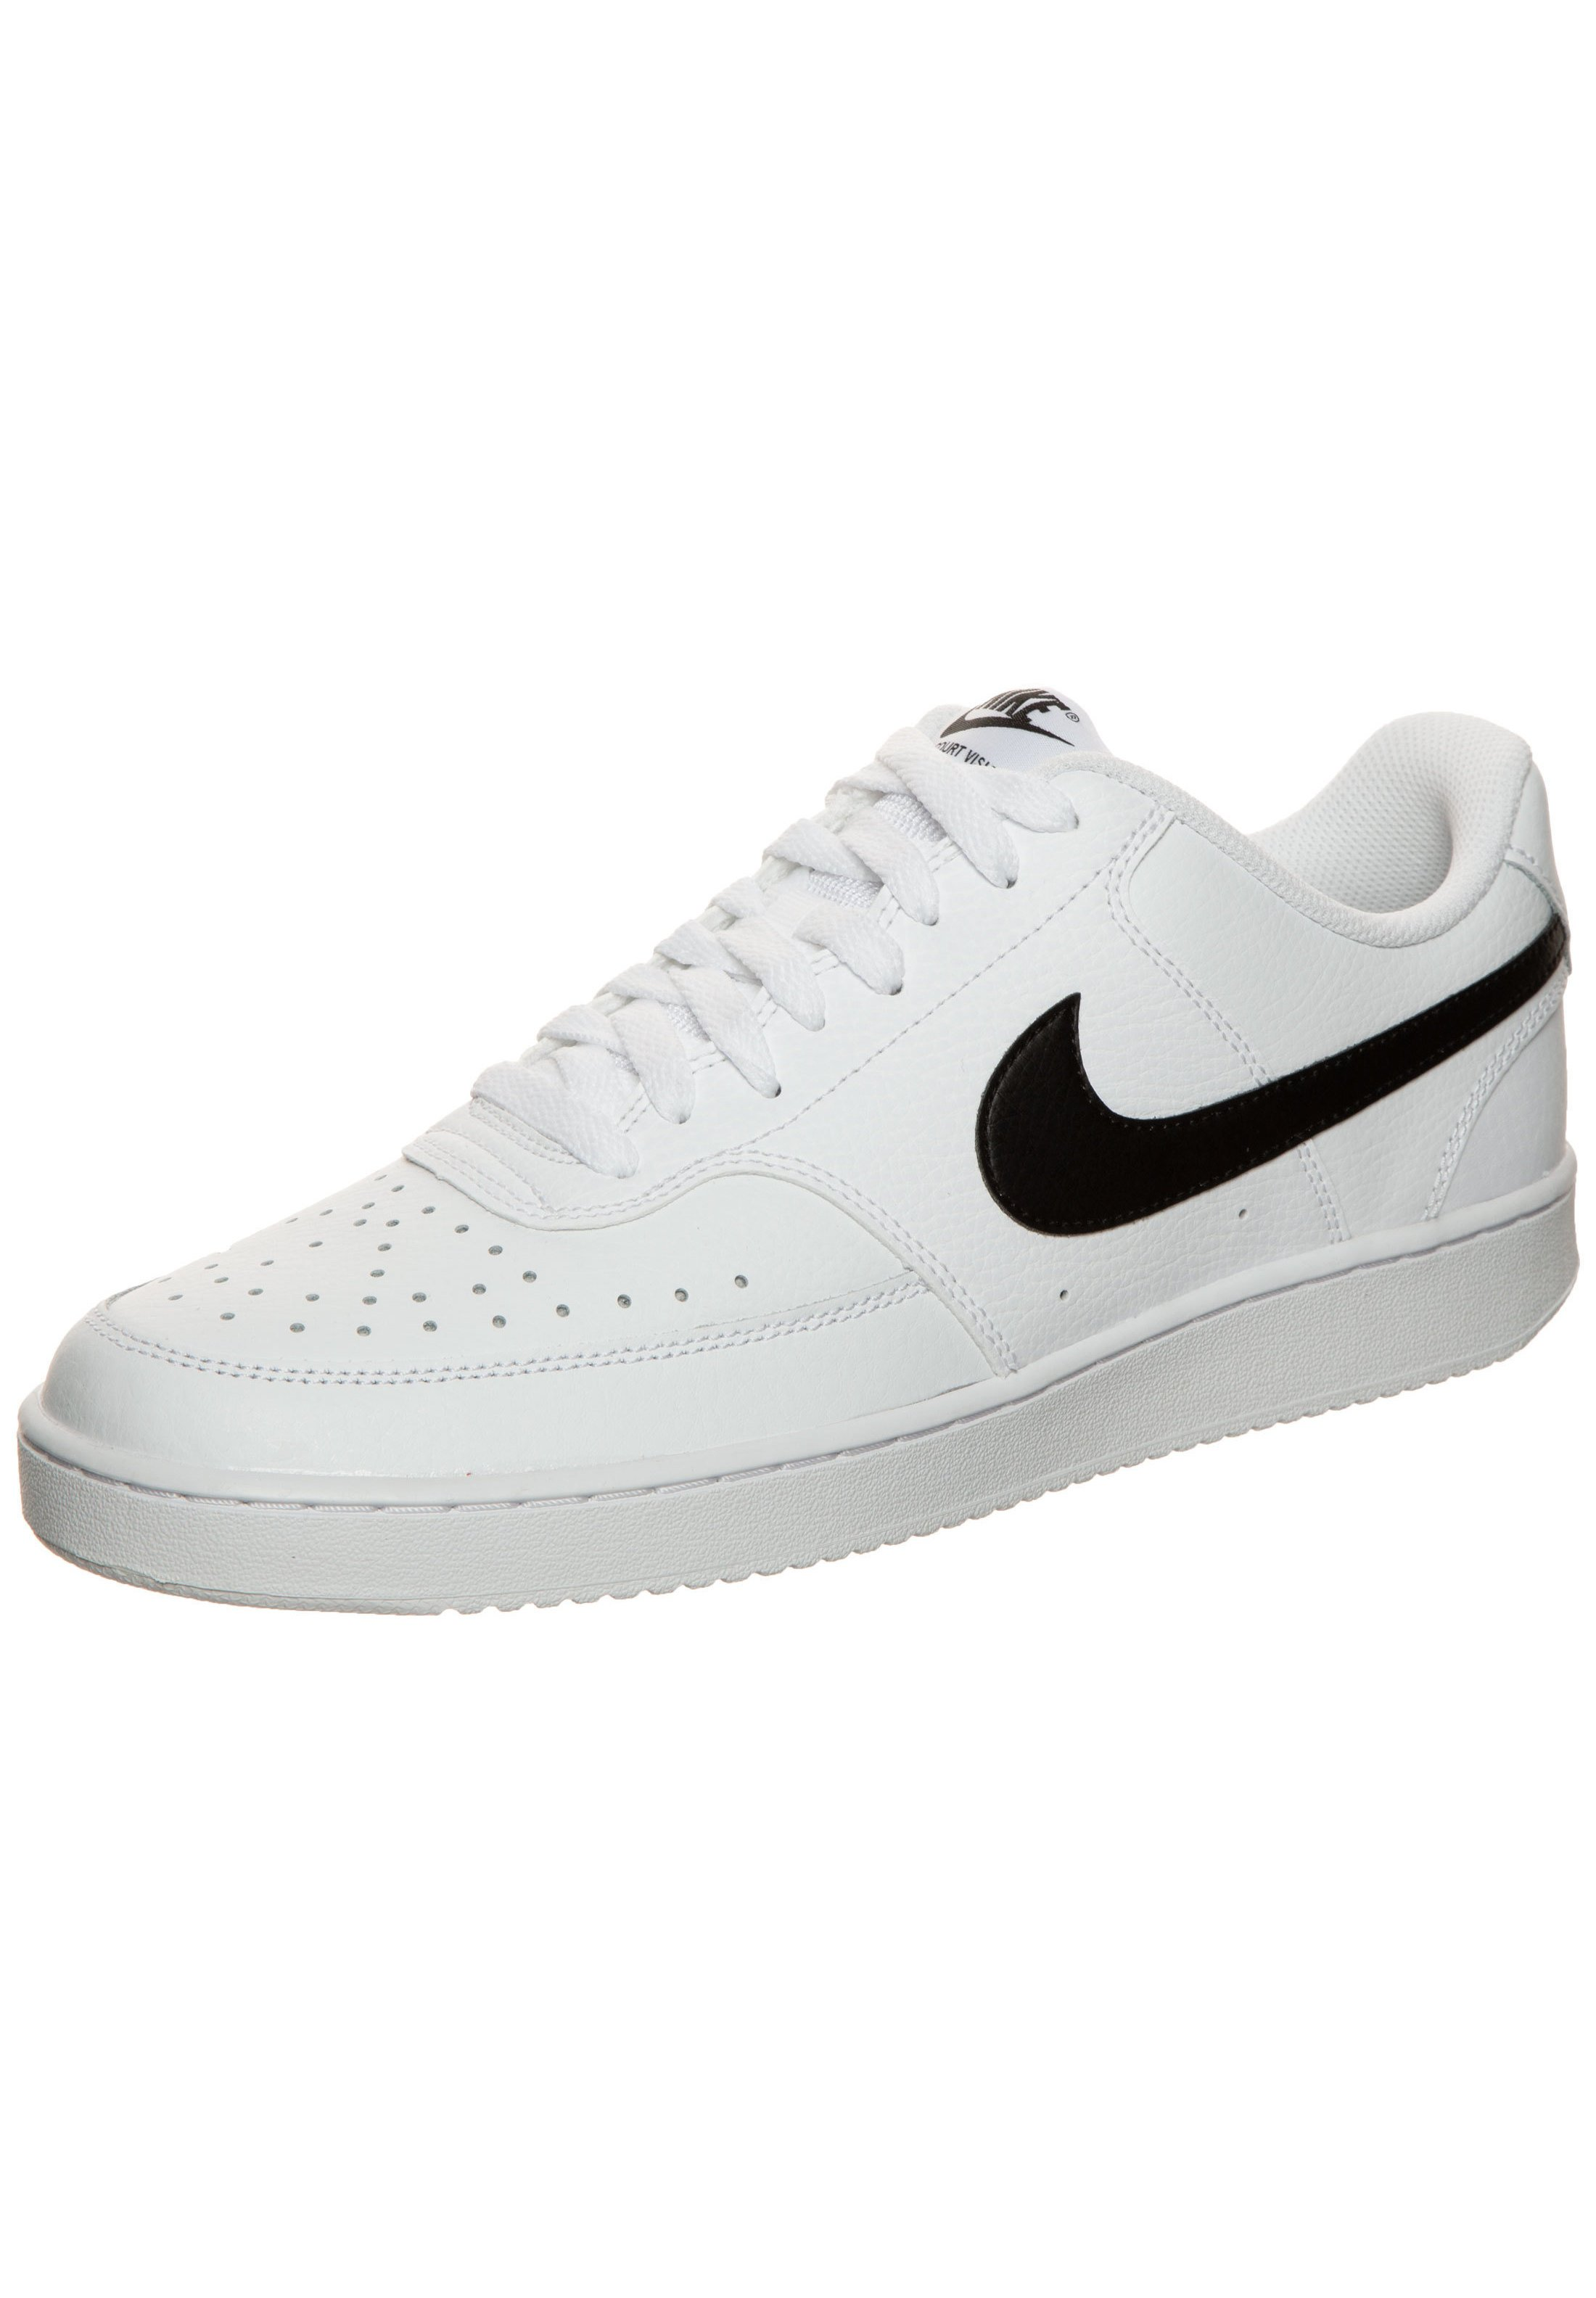 Nike Sportswear Sneaker low - white/black/white/weiß - Herrenschuhe 6g43O